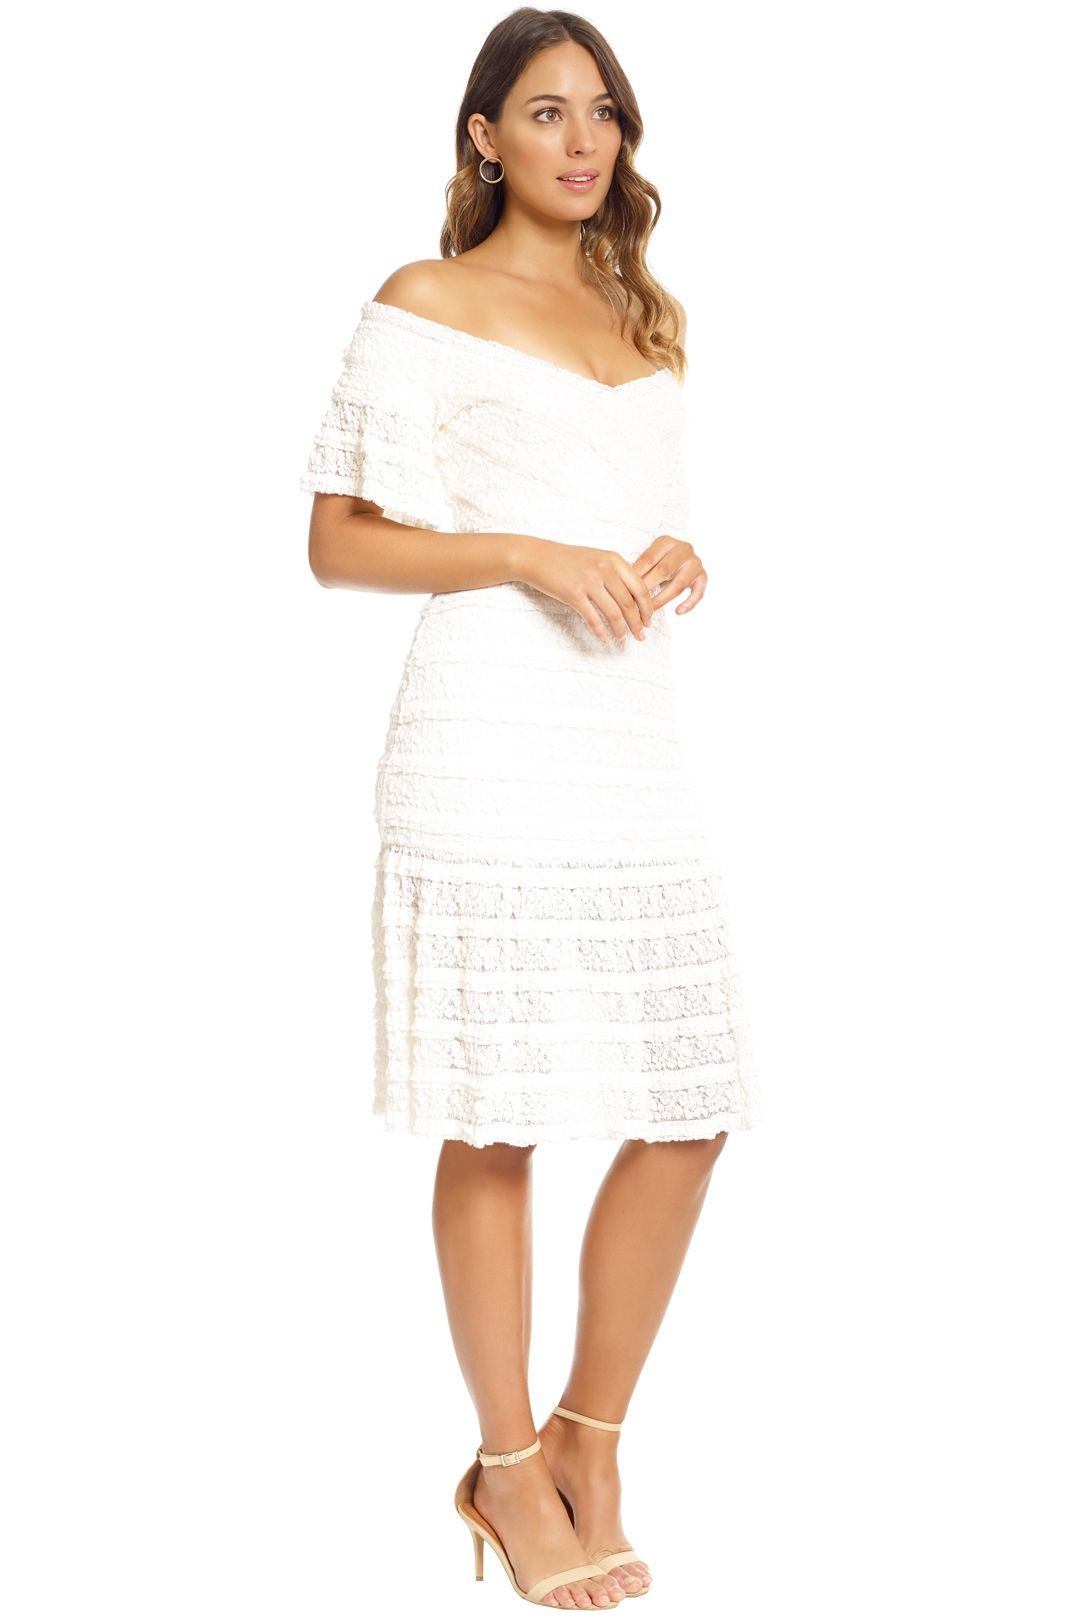 Saylor - Malinda Dress - White - Side